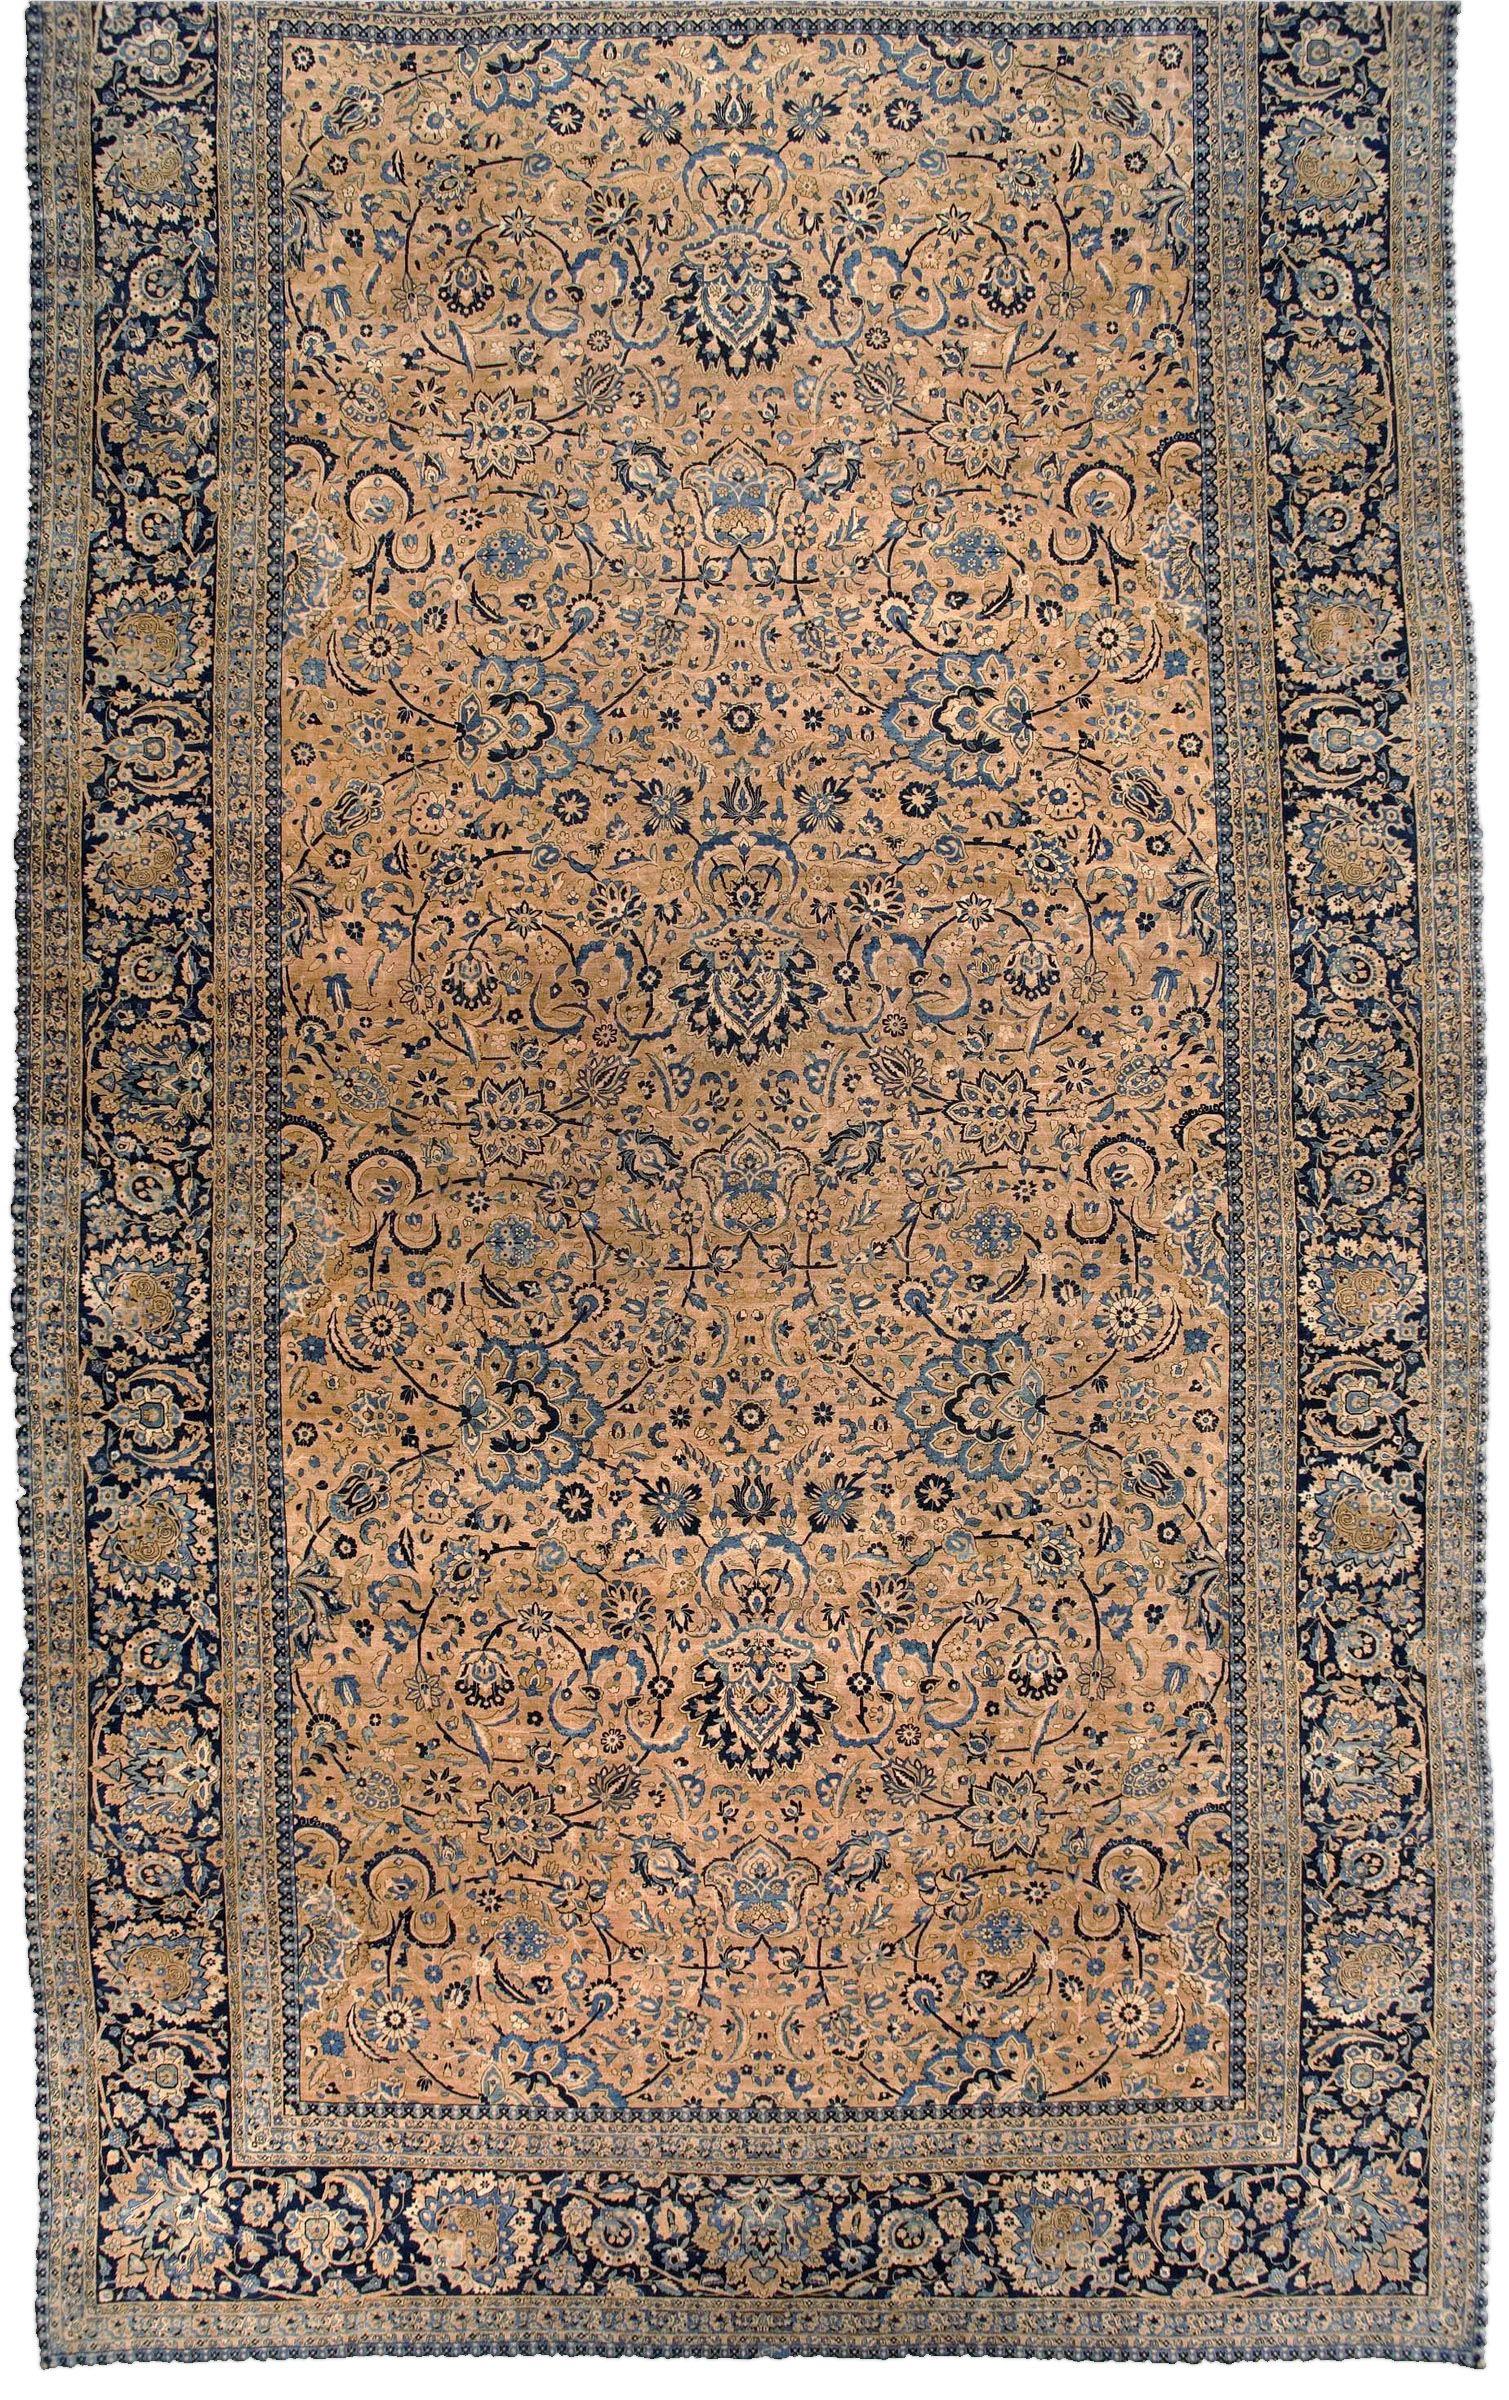 Oversized Vintage Persian Kirman Rug Extra Large Rugs Vintage Persian Rug Area Rugs